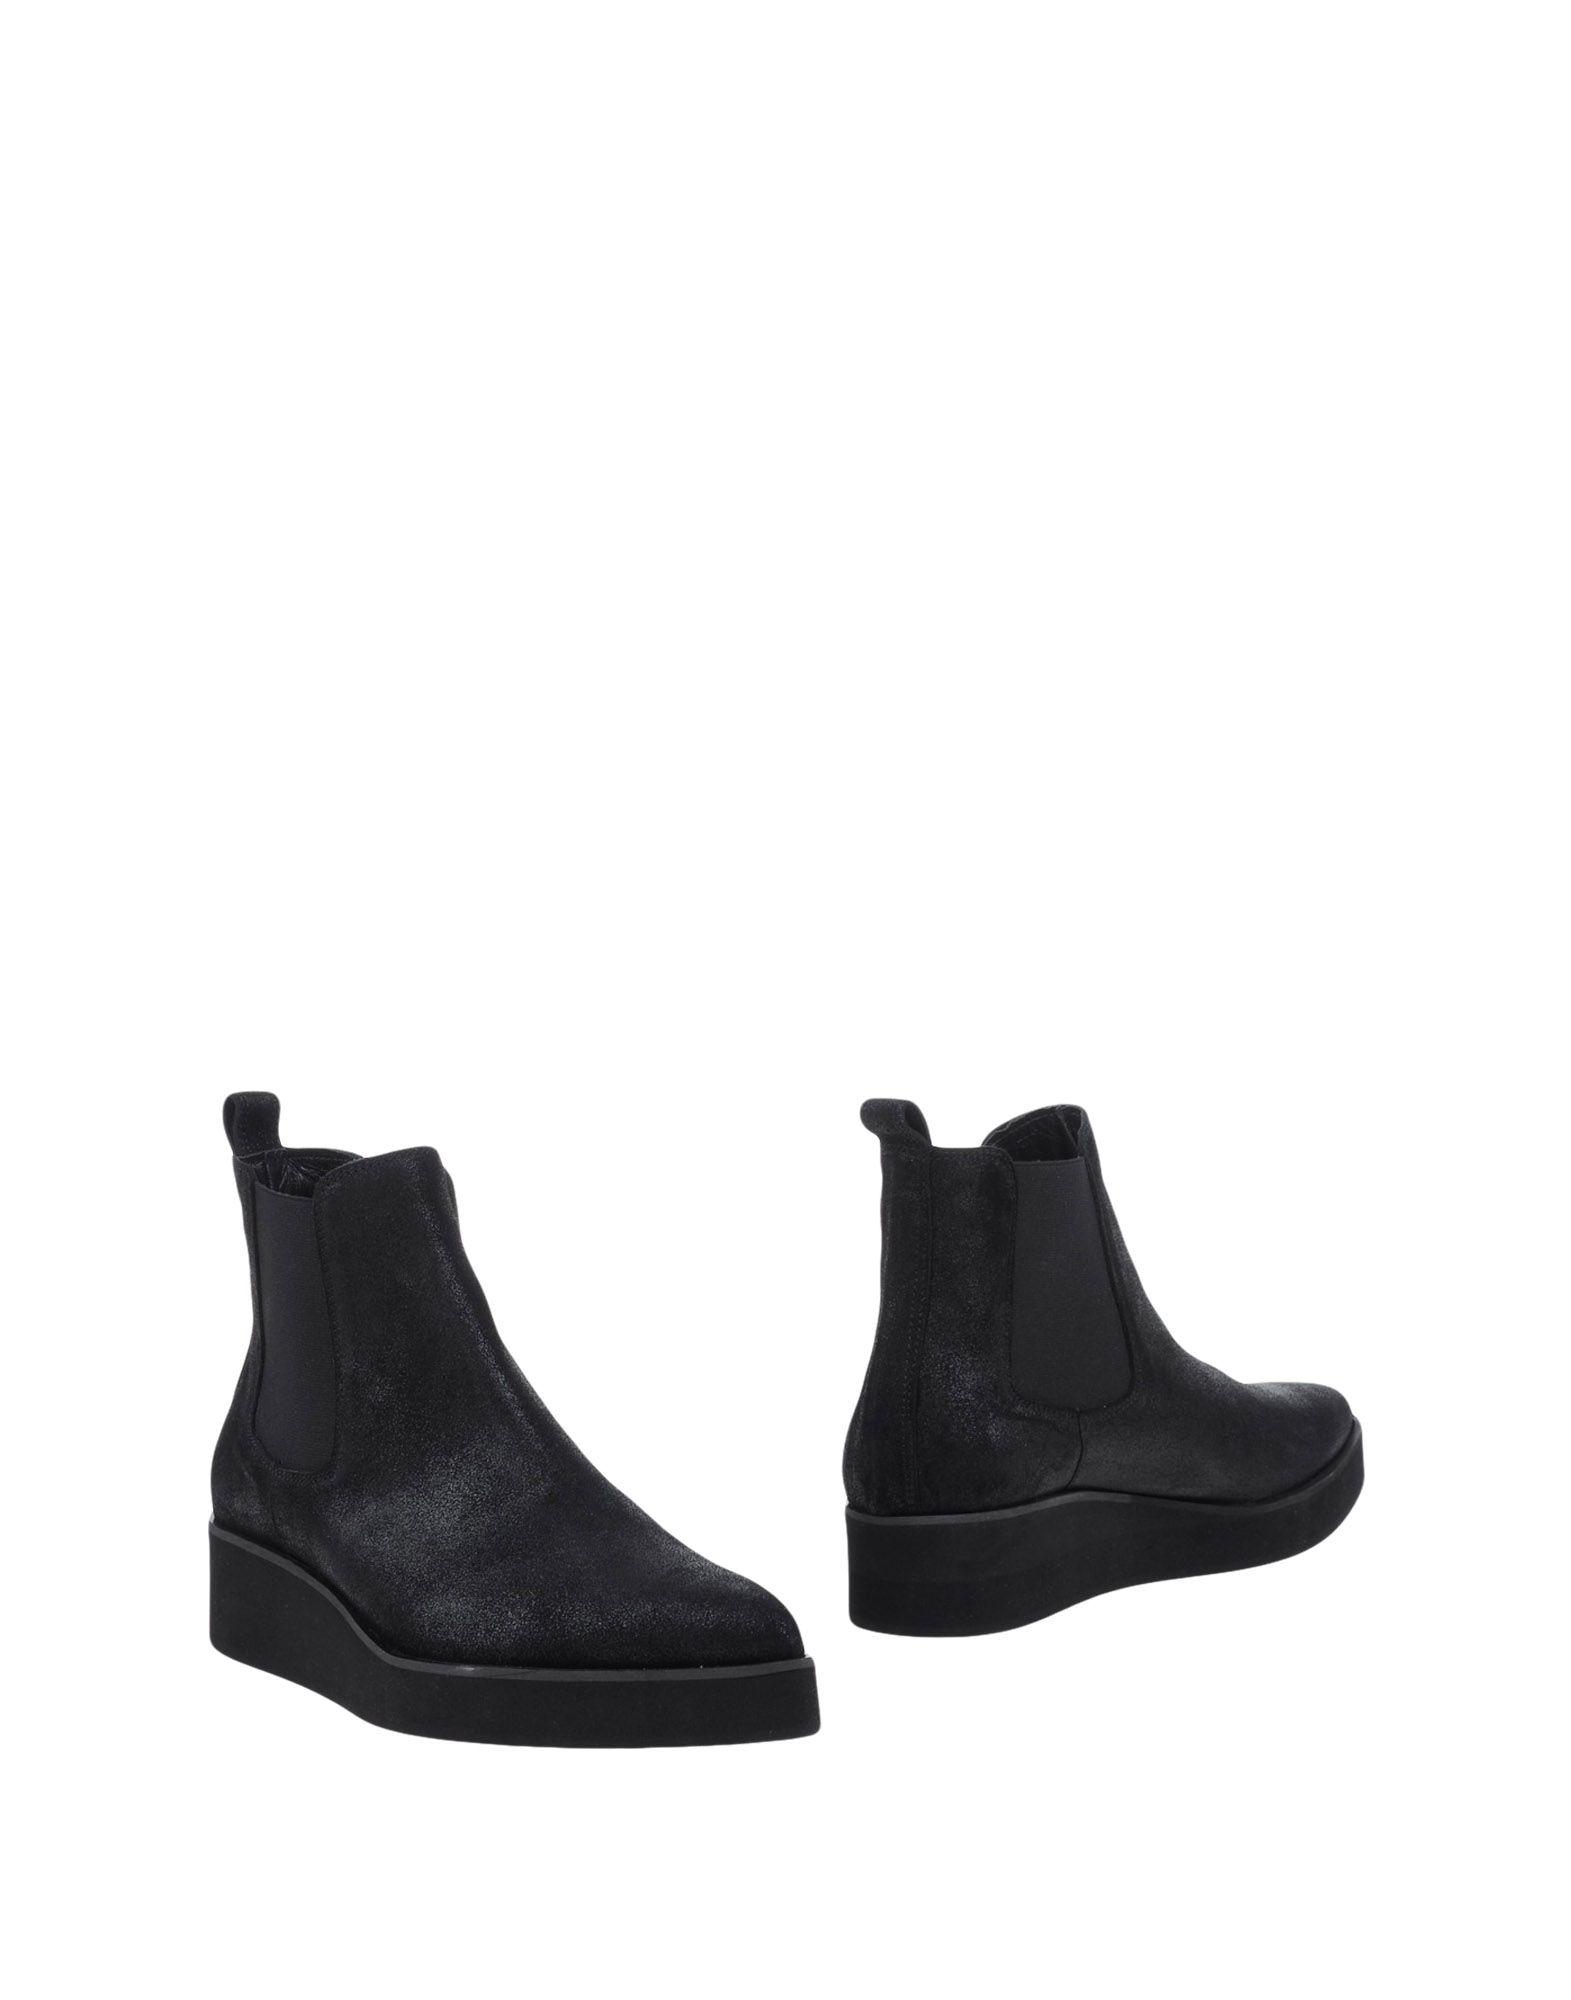 JUCCA Полусапоги и высокие ботинки mazzitti полусапоги и высокие ботинки